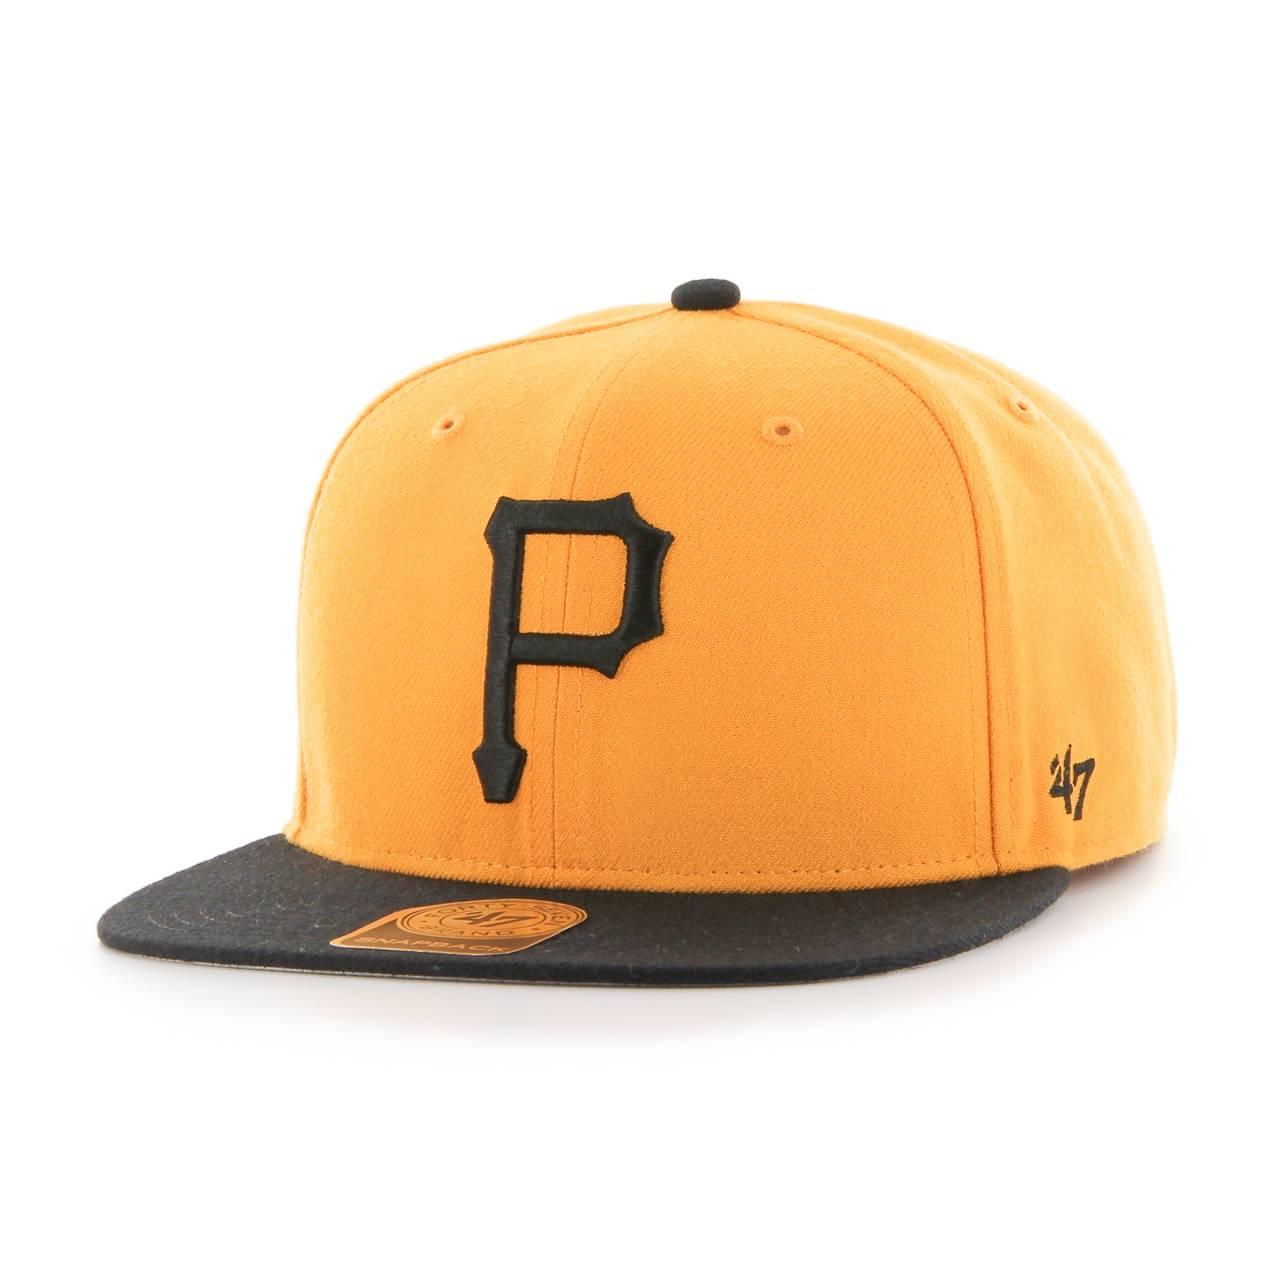 47-mlb-pittsburgh-pirates-yellow-snapback